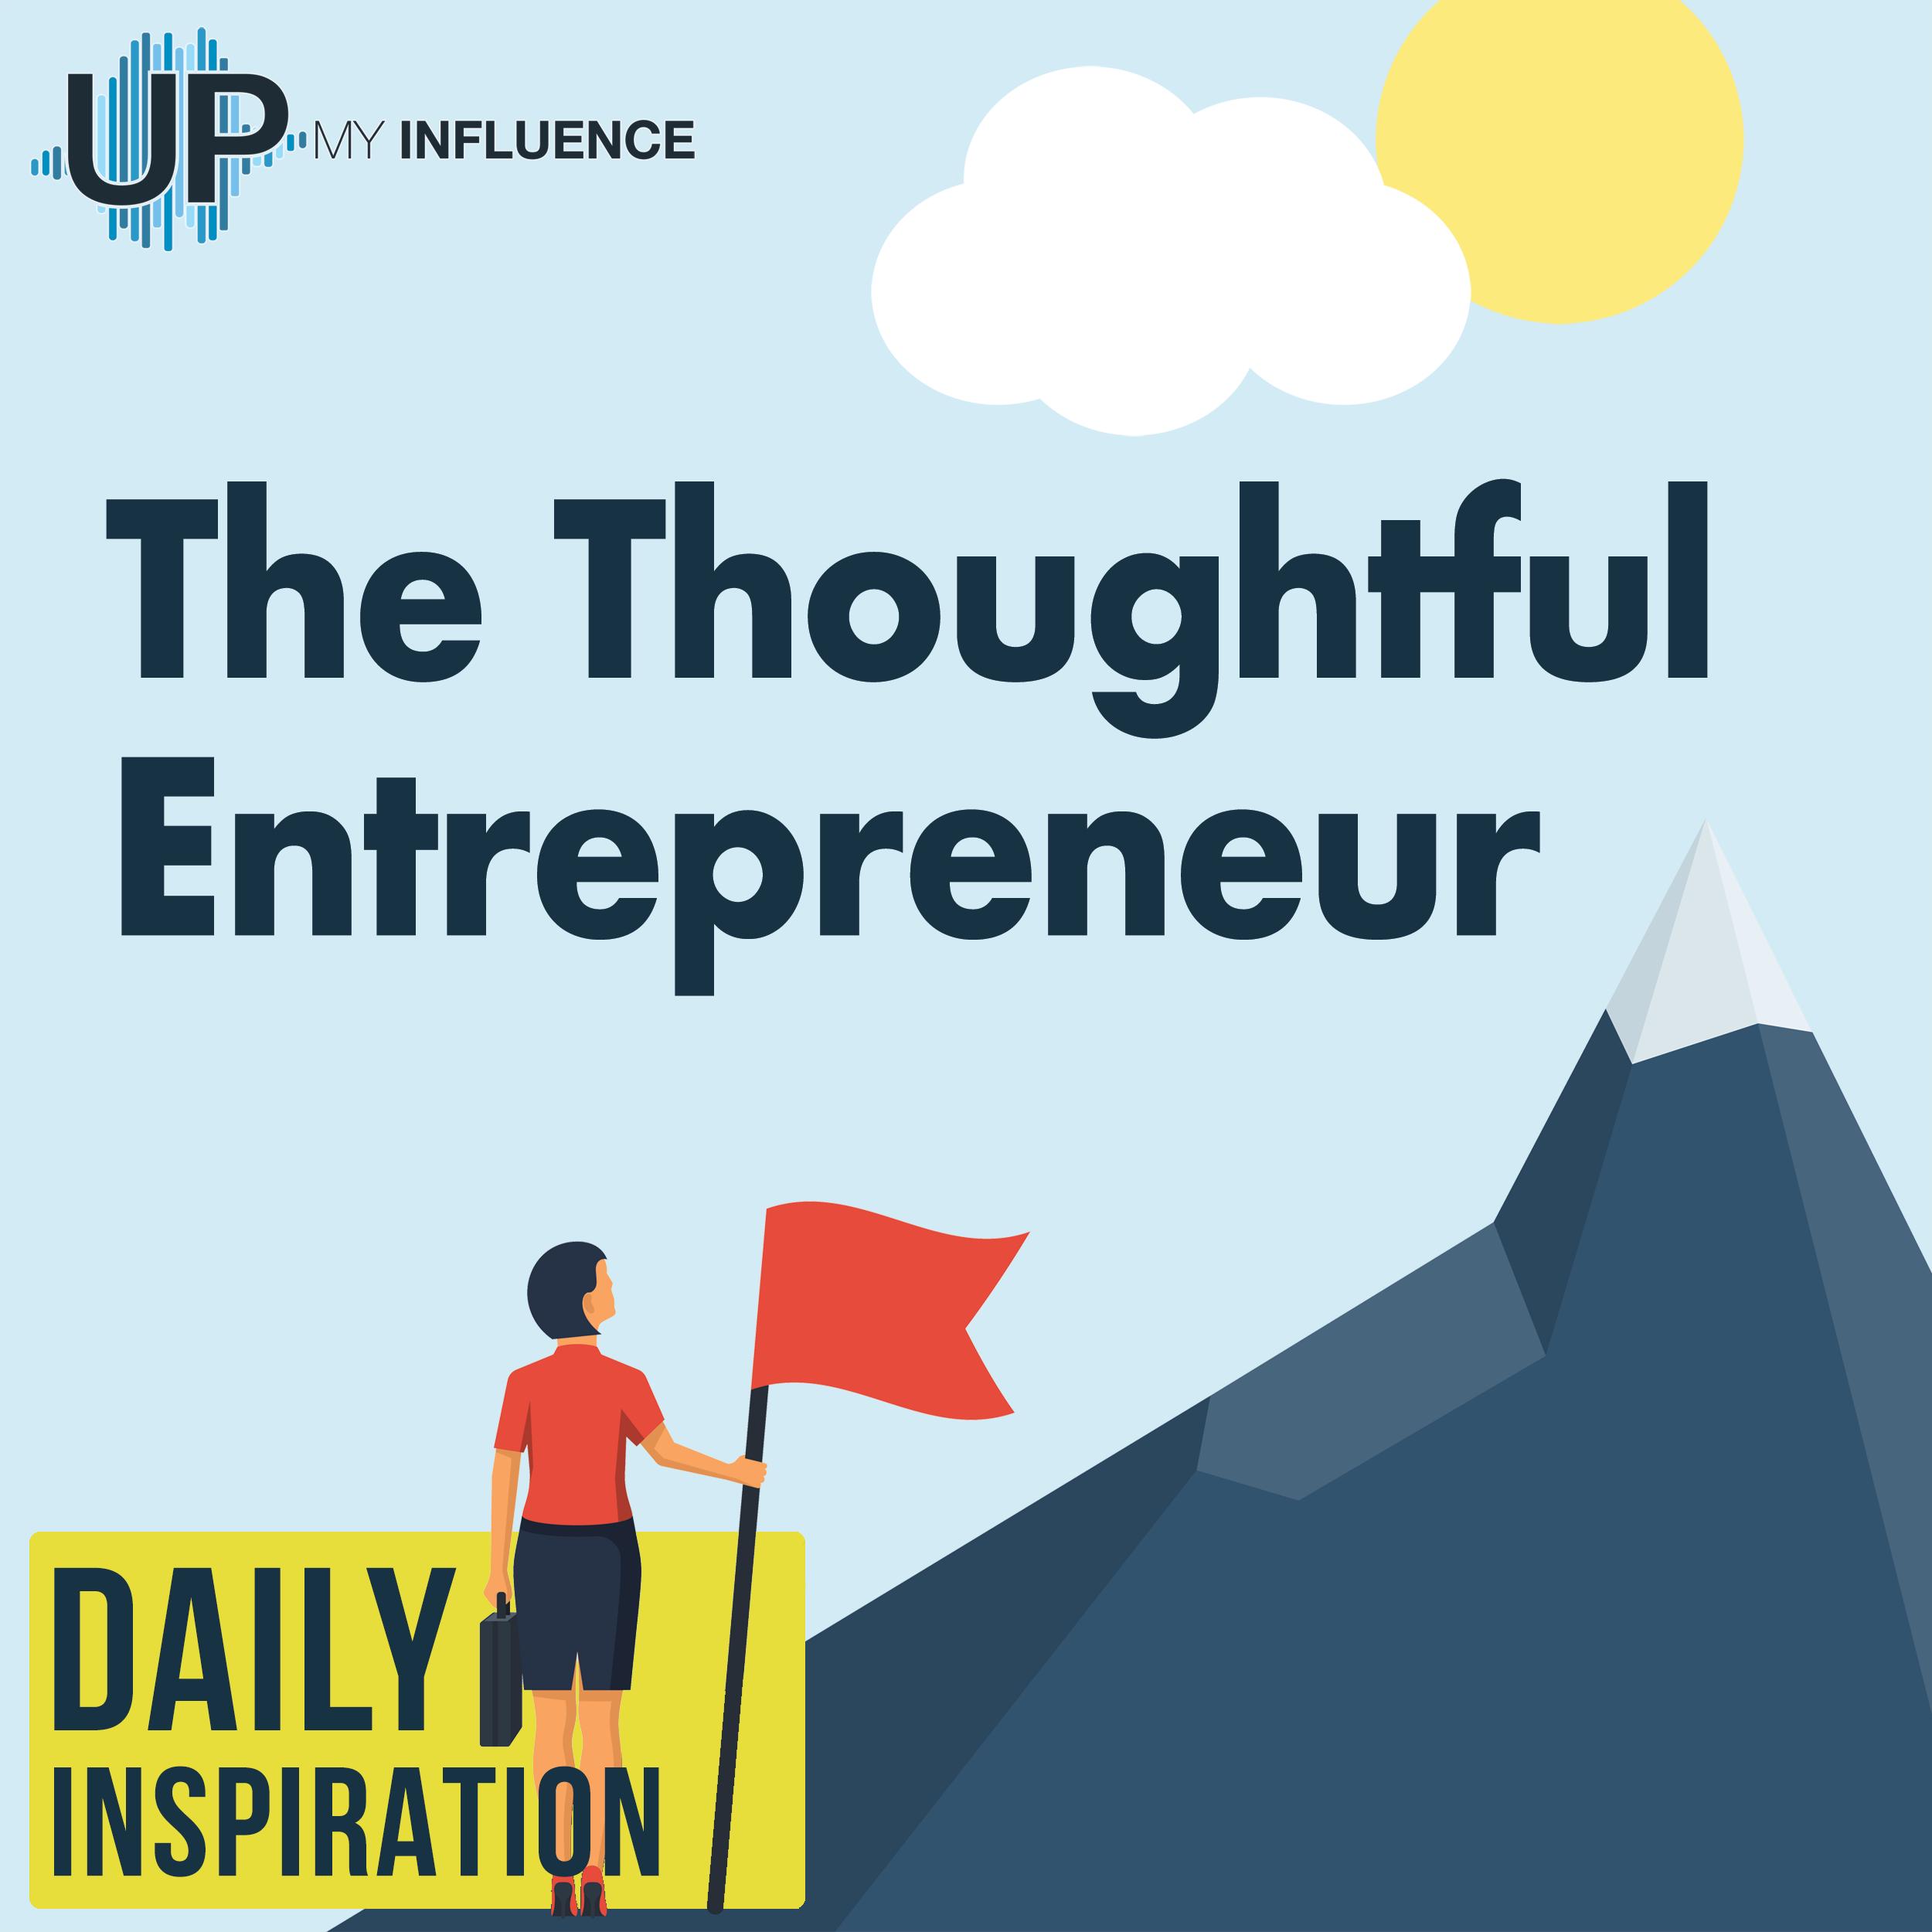 Artwork for podcast The Thoughtful Entrepreneur